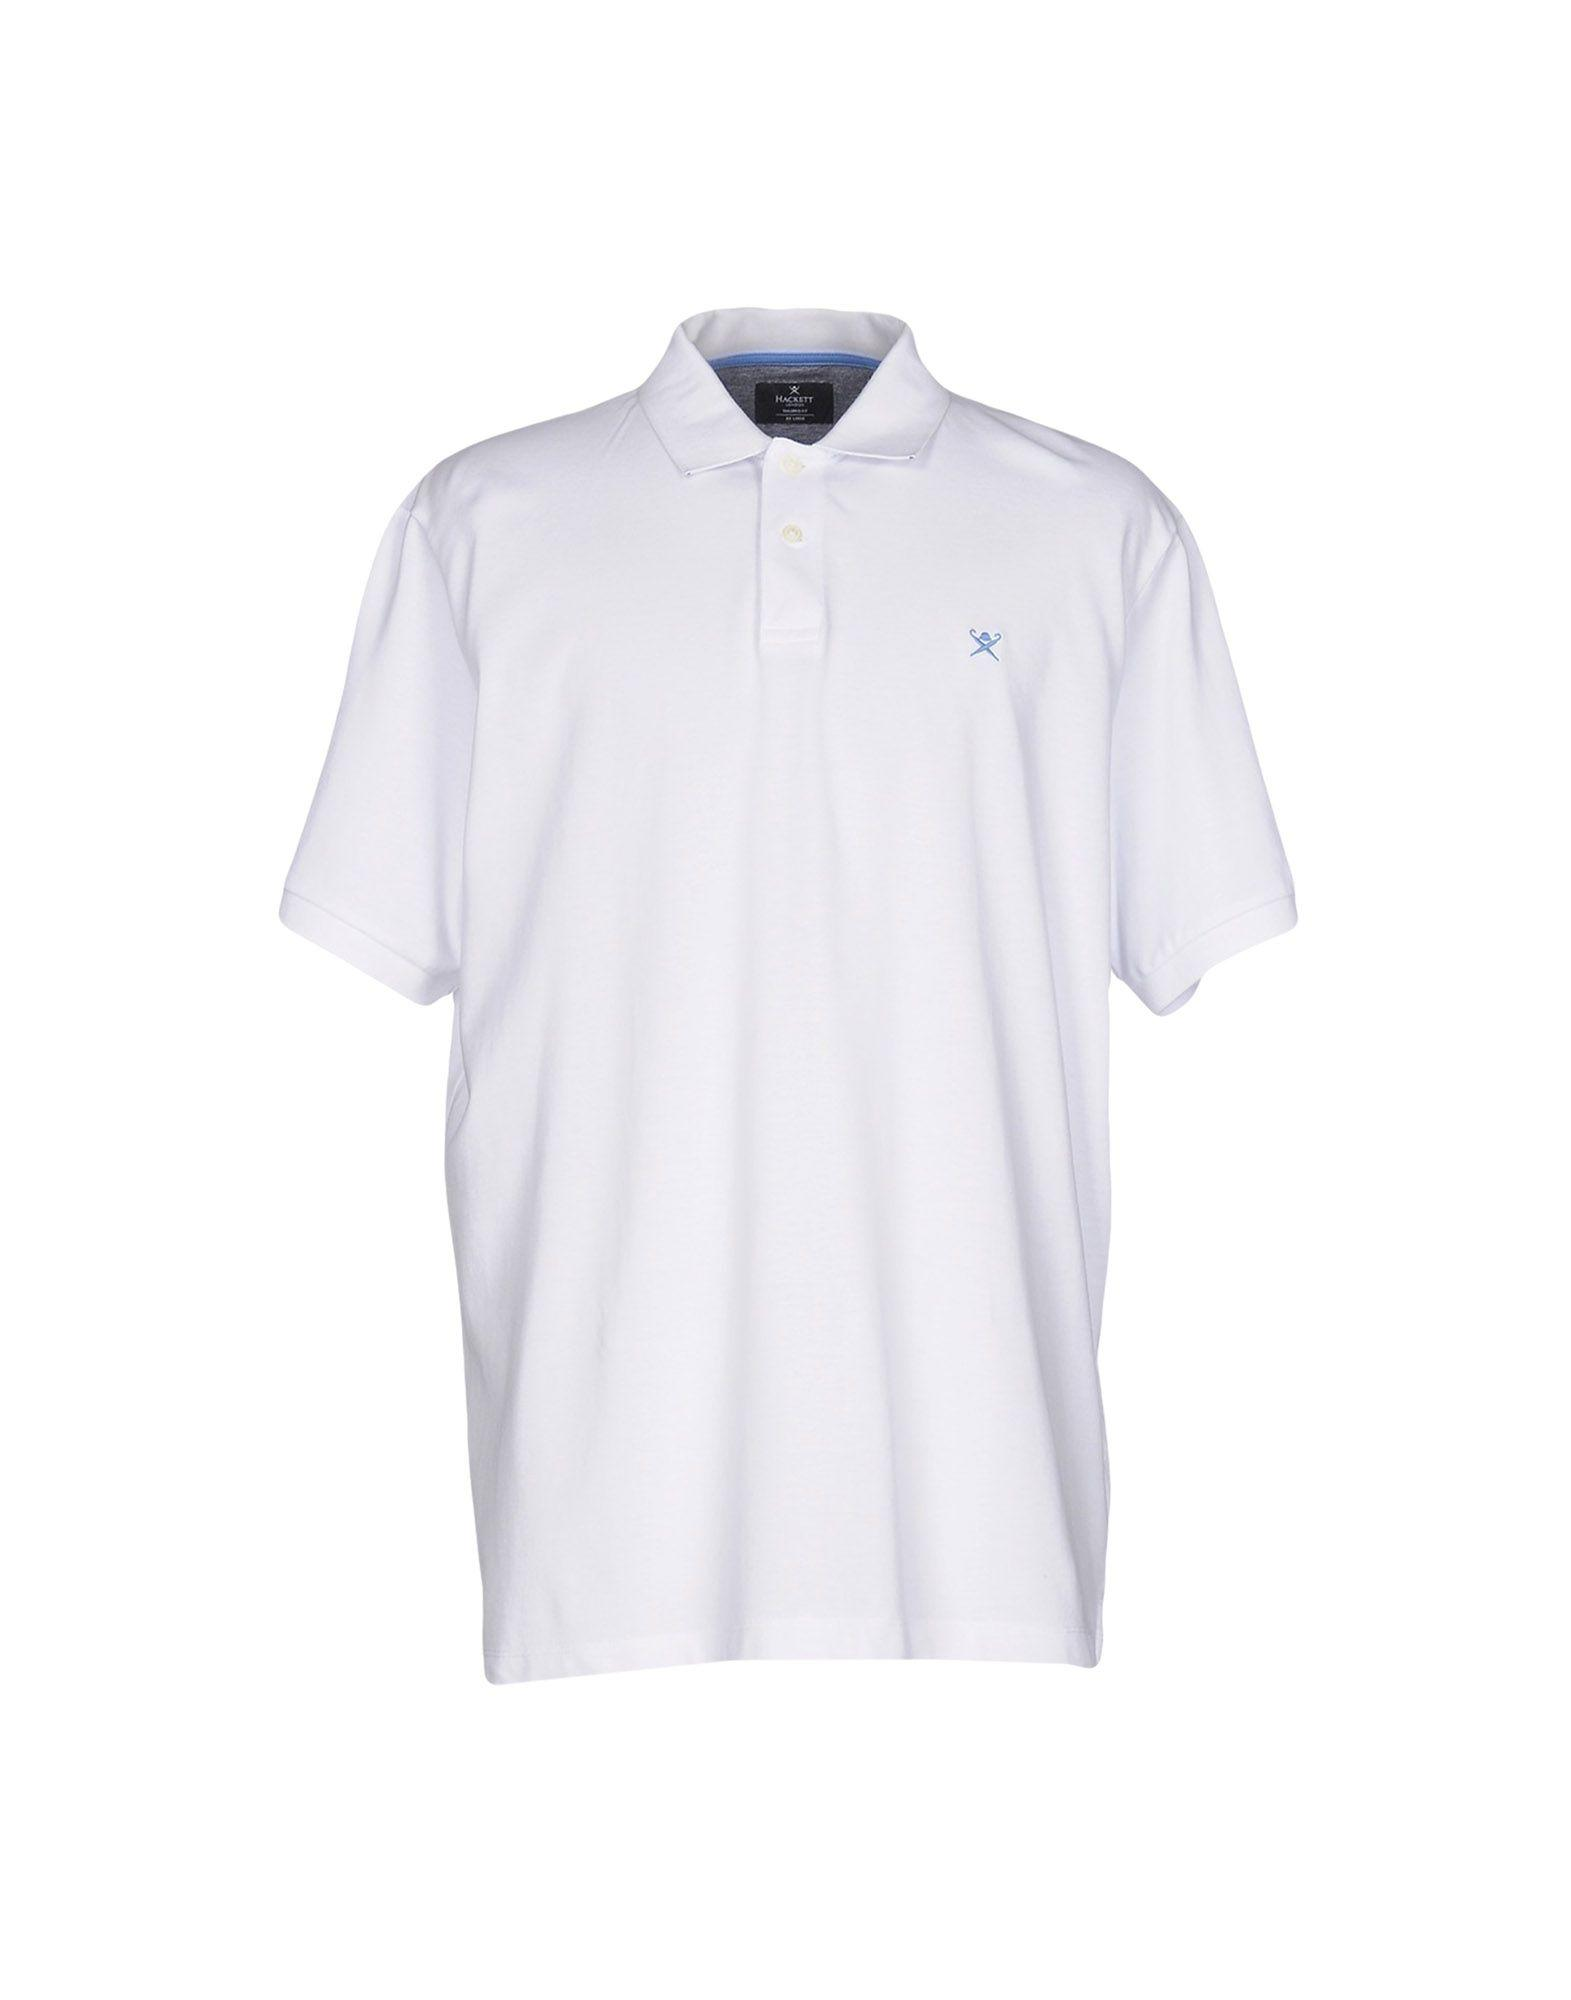 377c200210e3 Hackett Polo Shirts In White